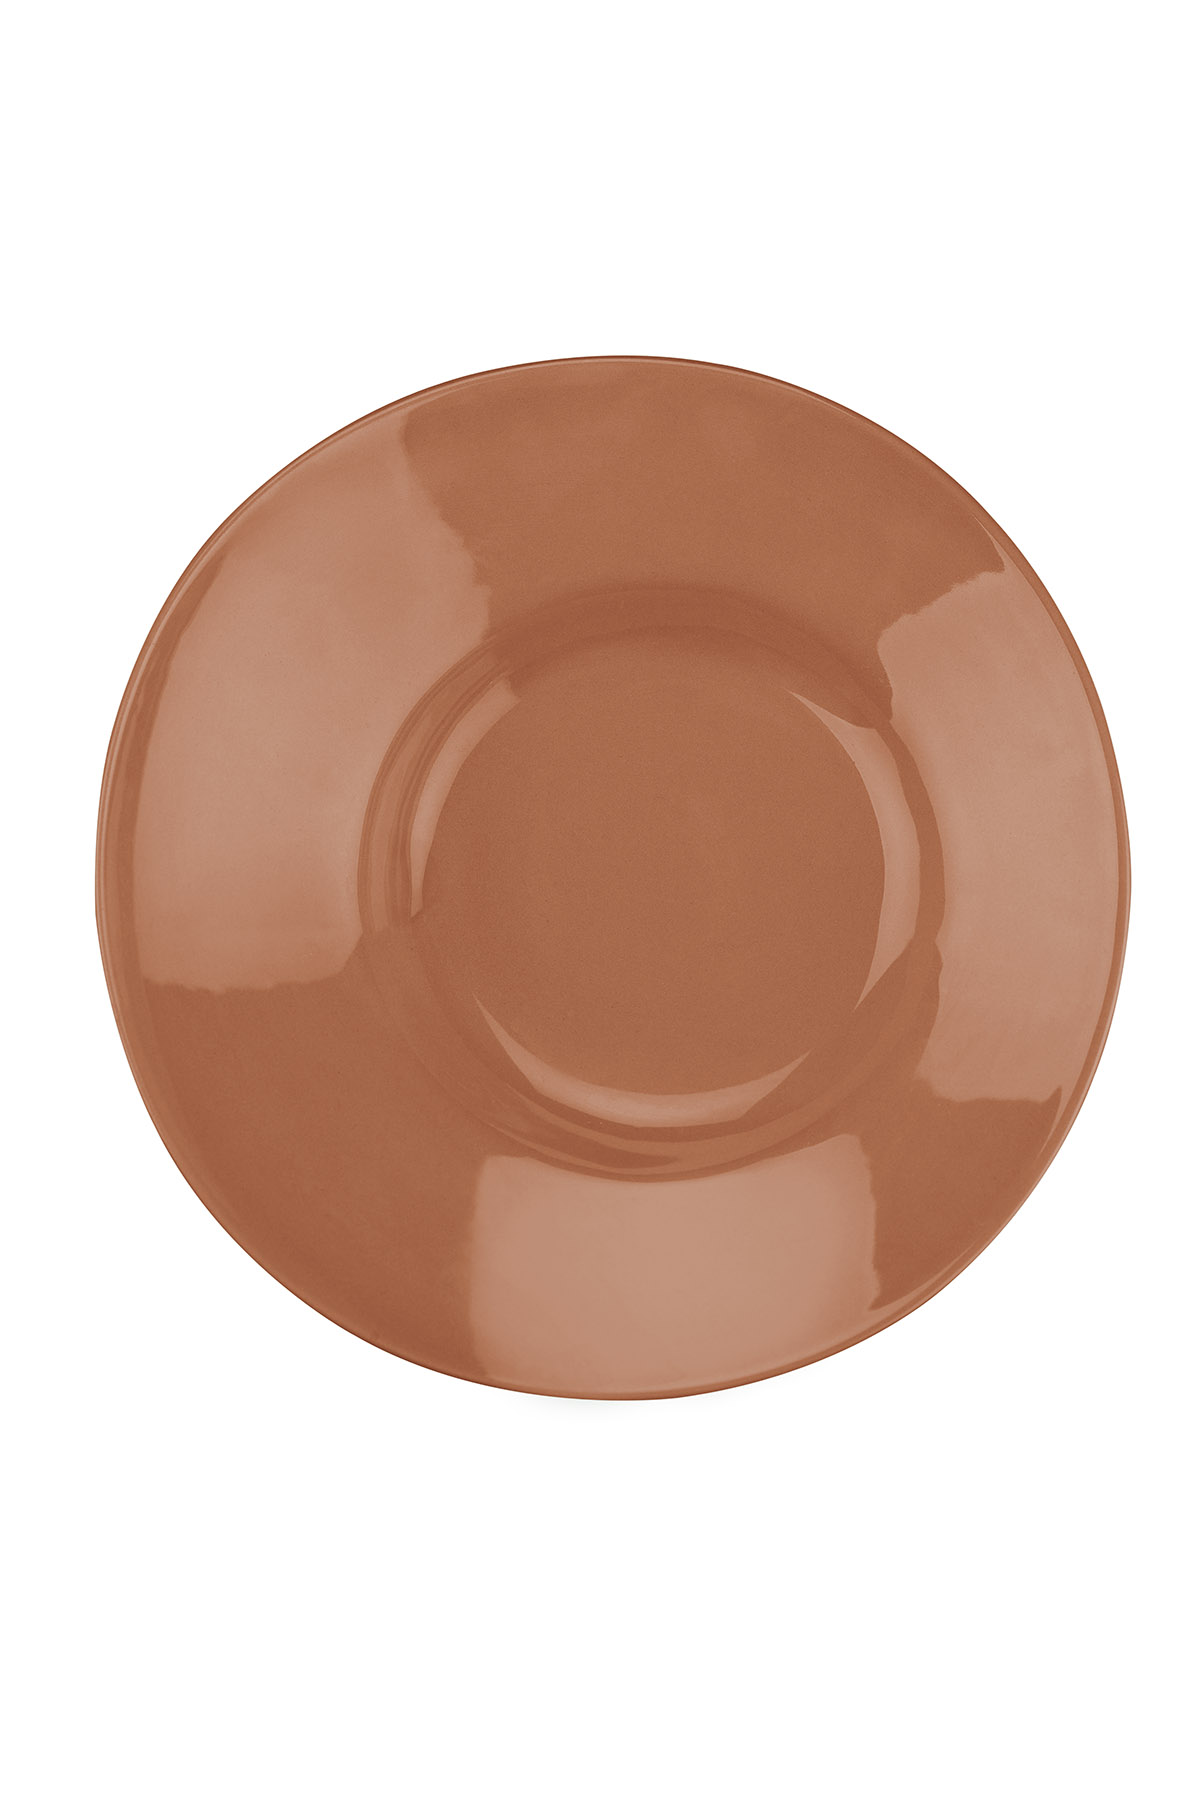 Kütahya Porselen - Aura 20 cm Çukur Tabak Kirmizi